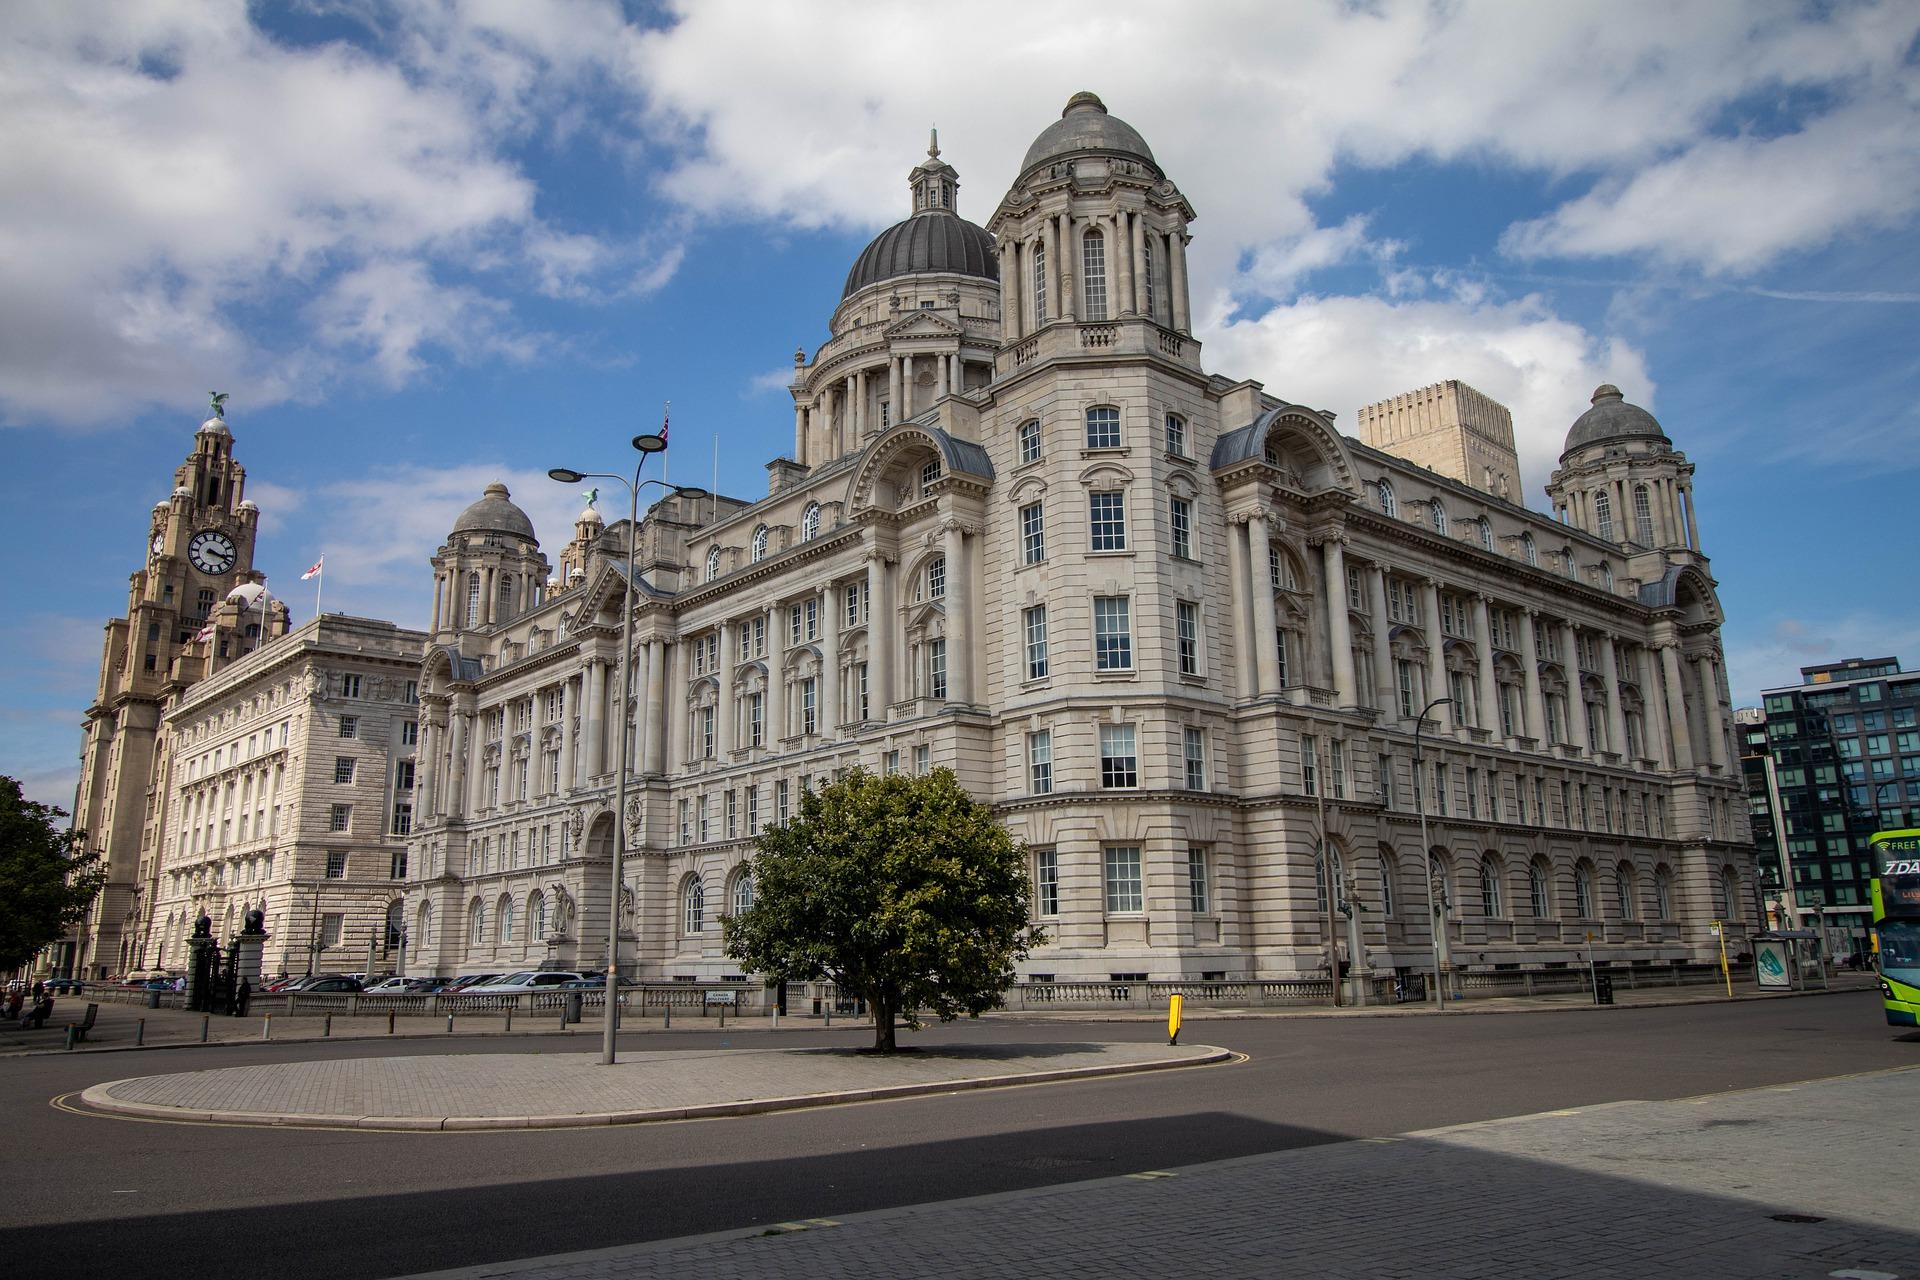 Liverpool Cunard Building Three Graces